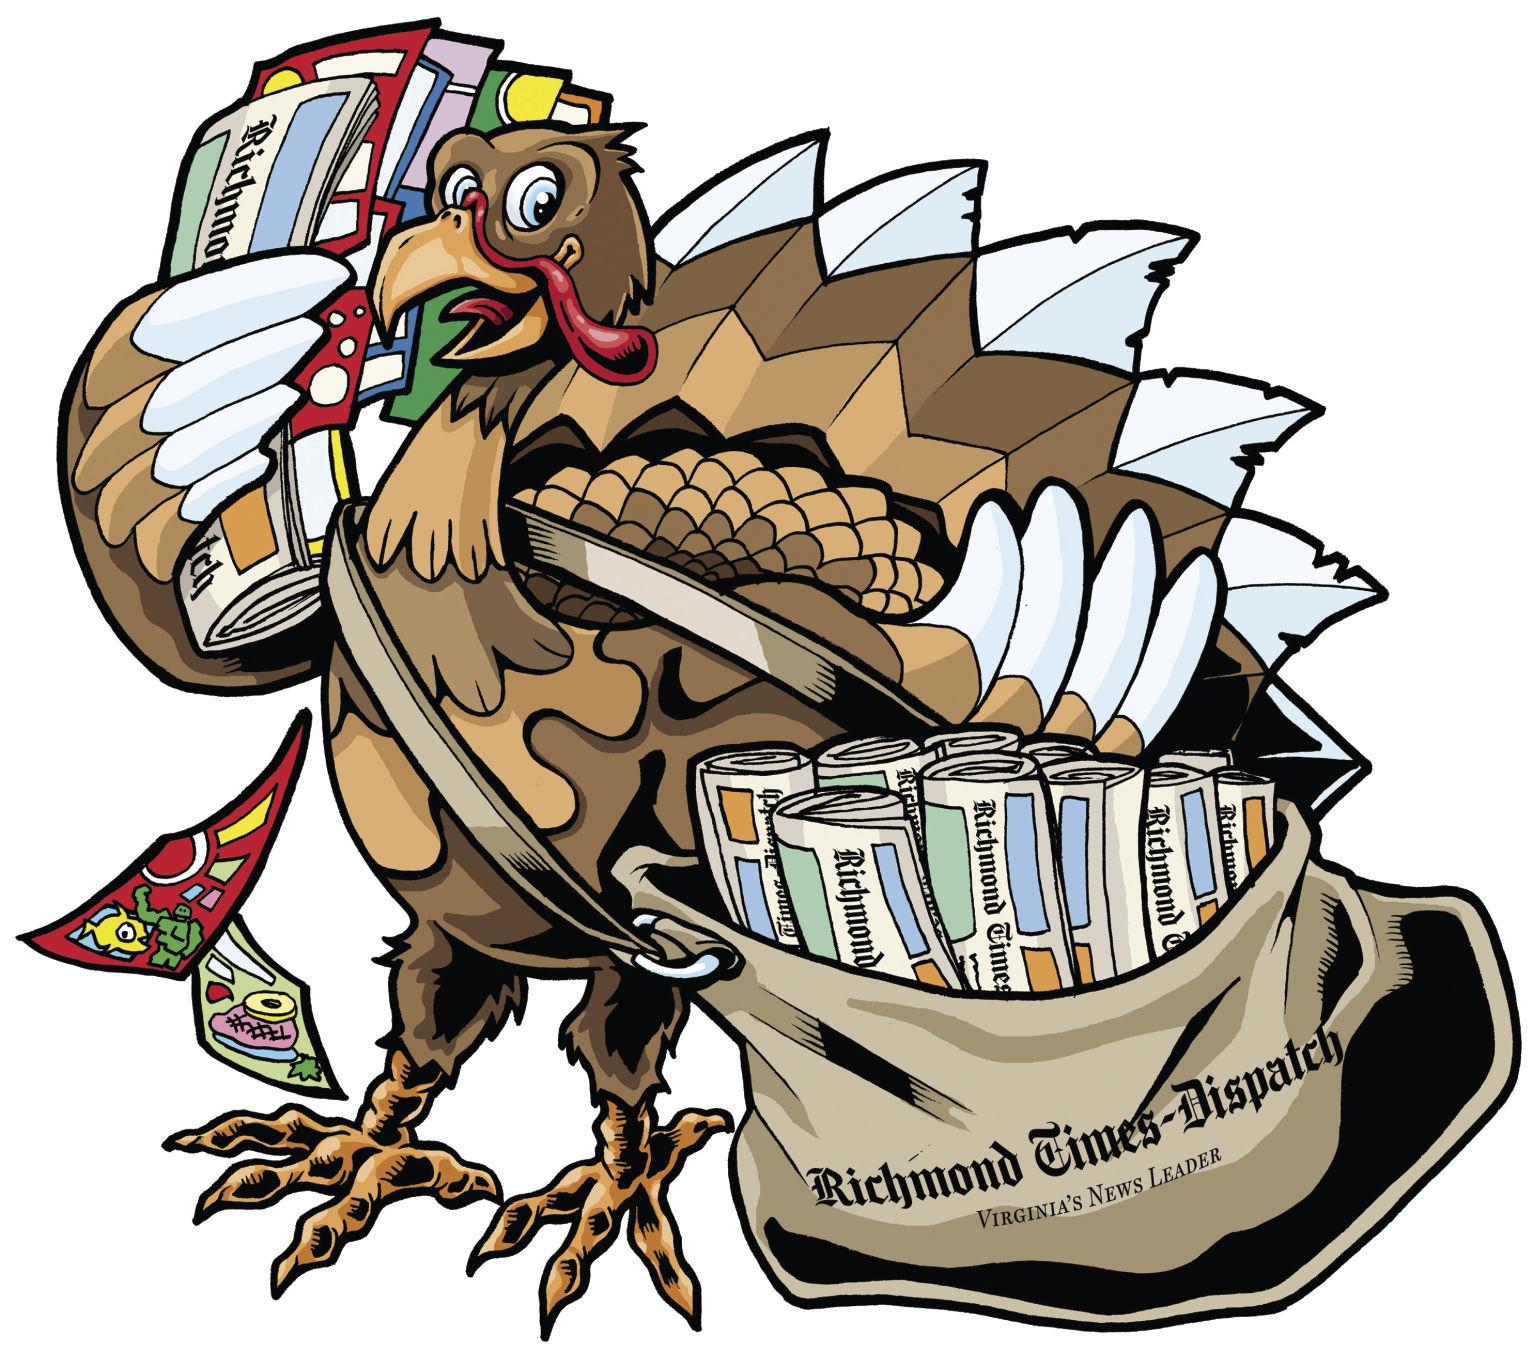 Thanksgiving Day Newspaper